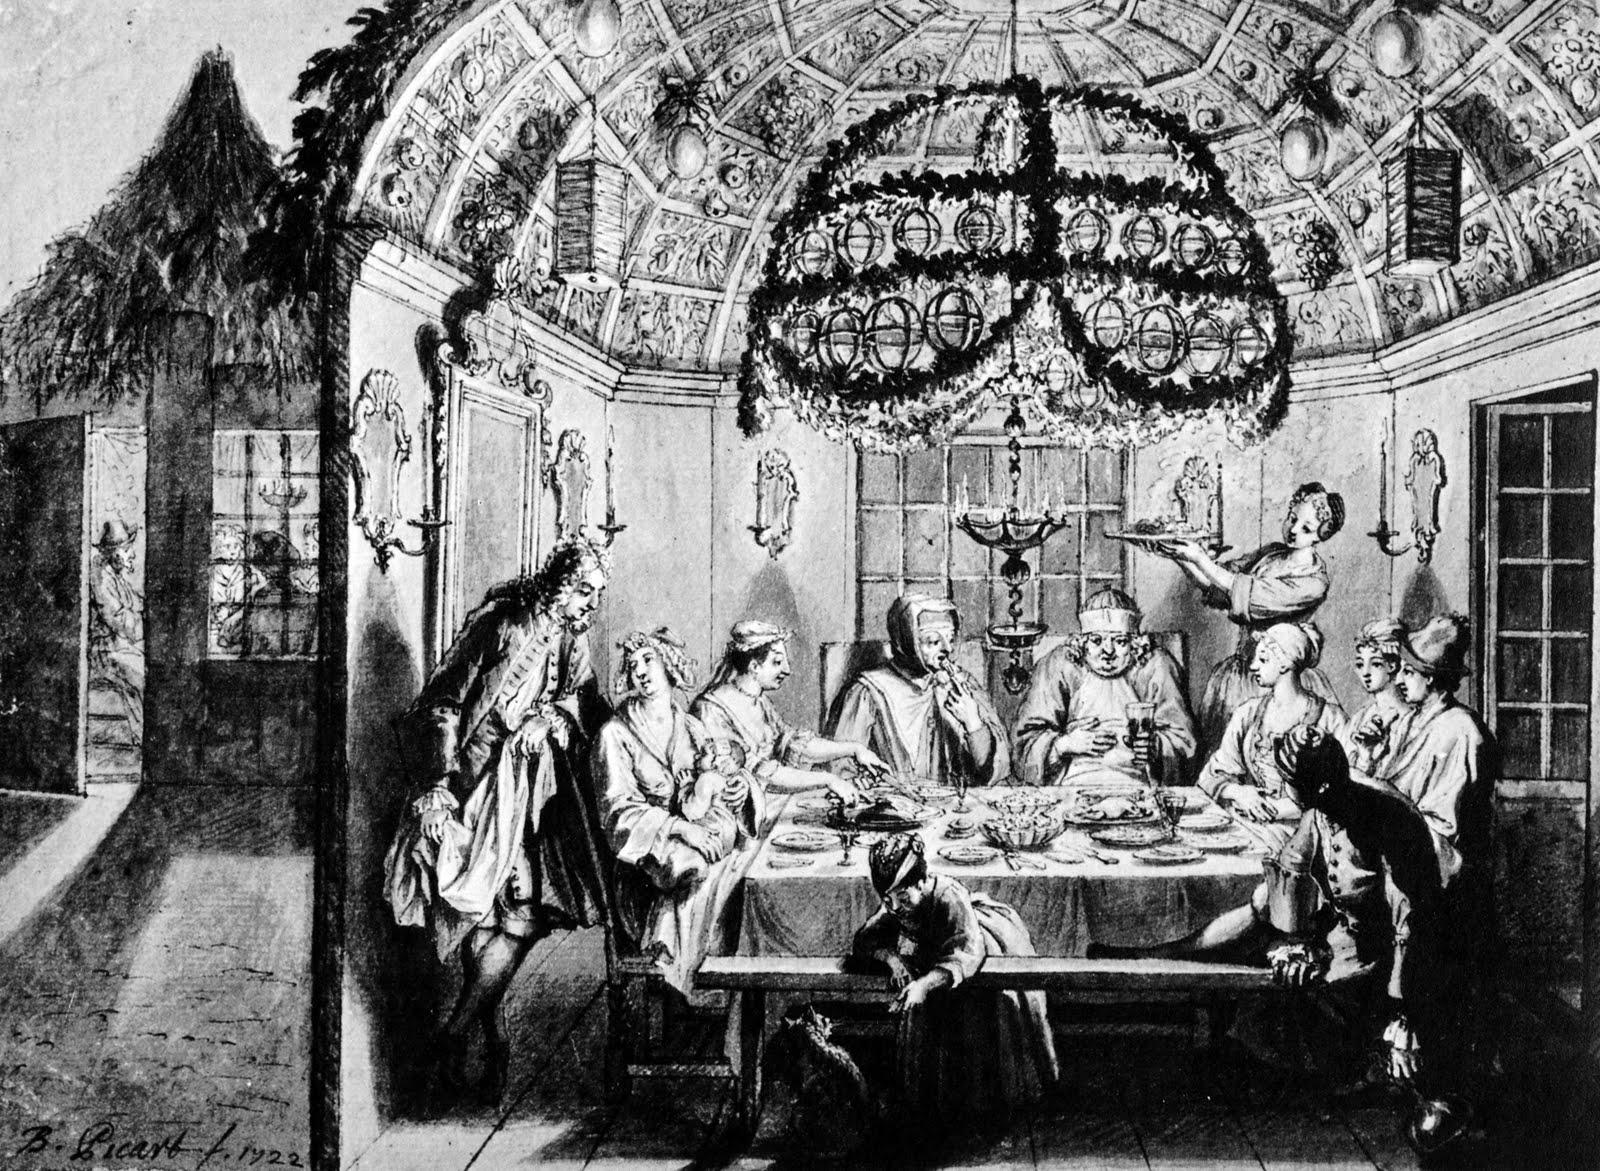 Sukkah meal Amsterdam 1922 Bernard Picart Wigoder editor Jewish Art Civilization 1972 p60-1.JPG